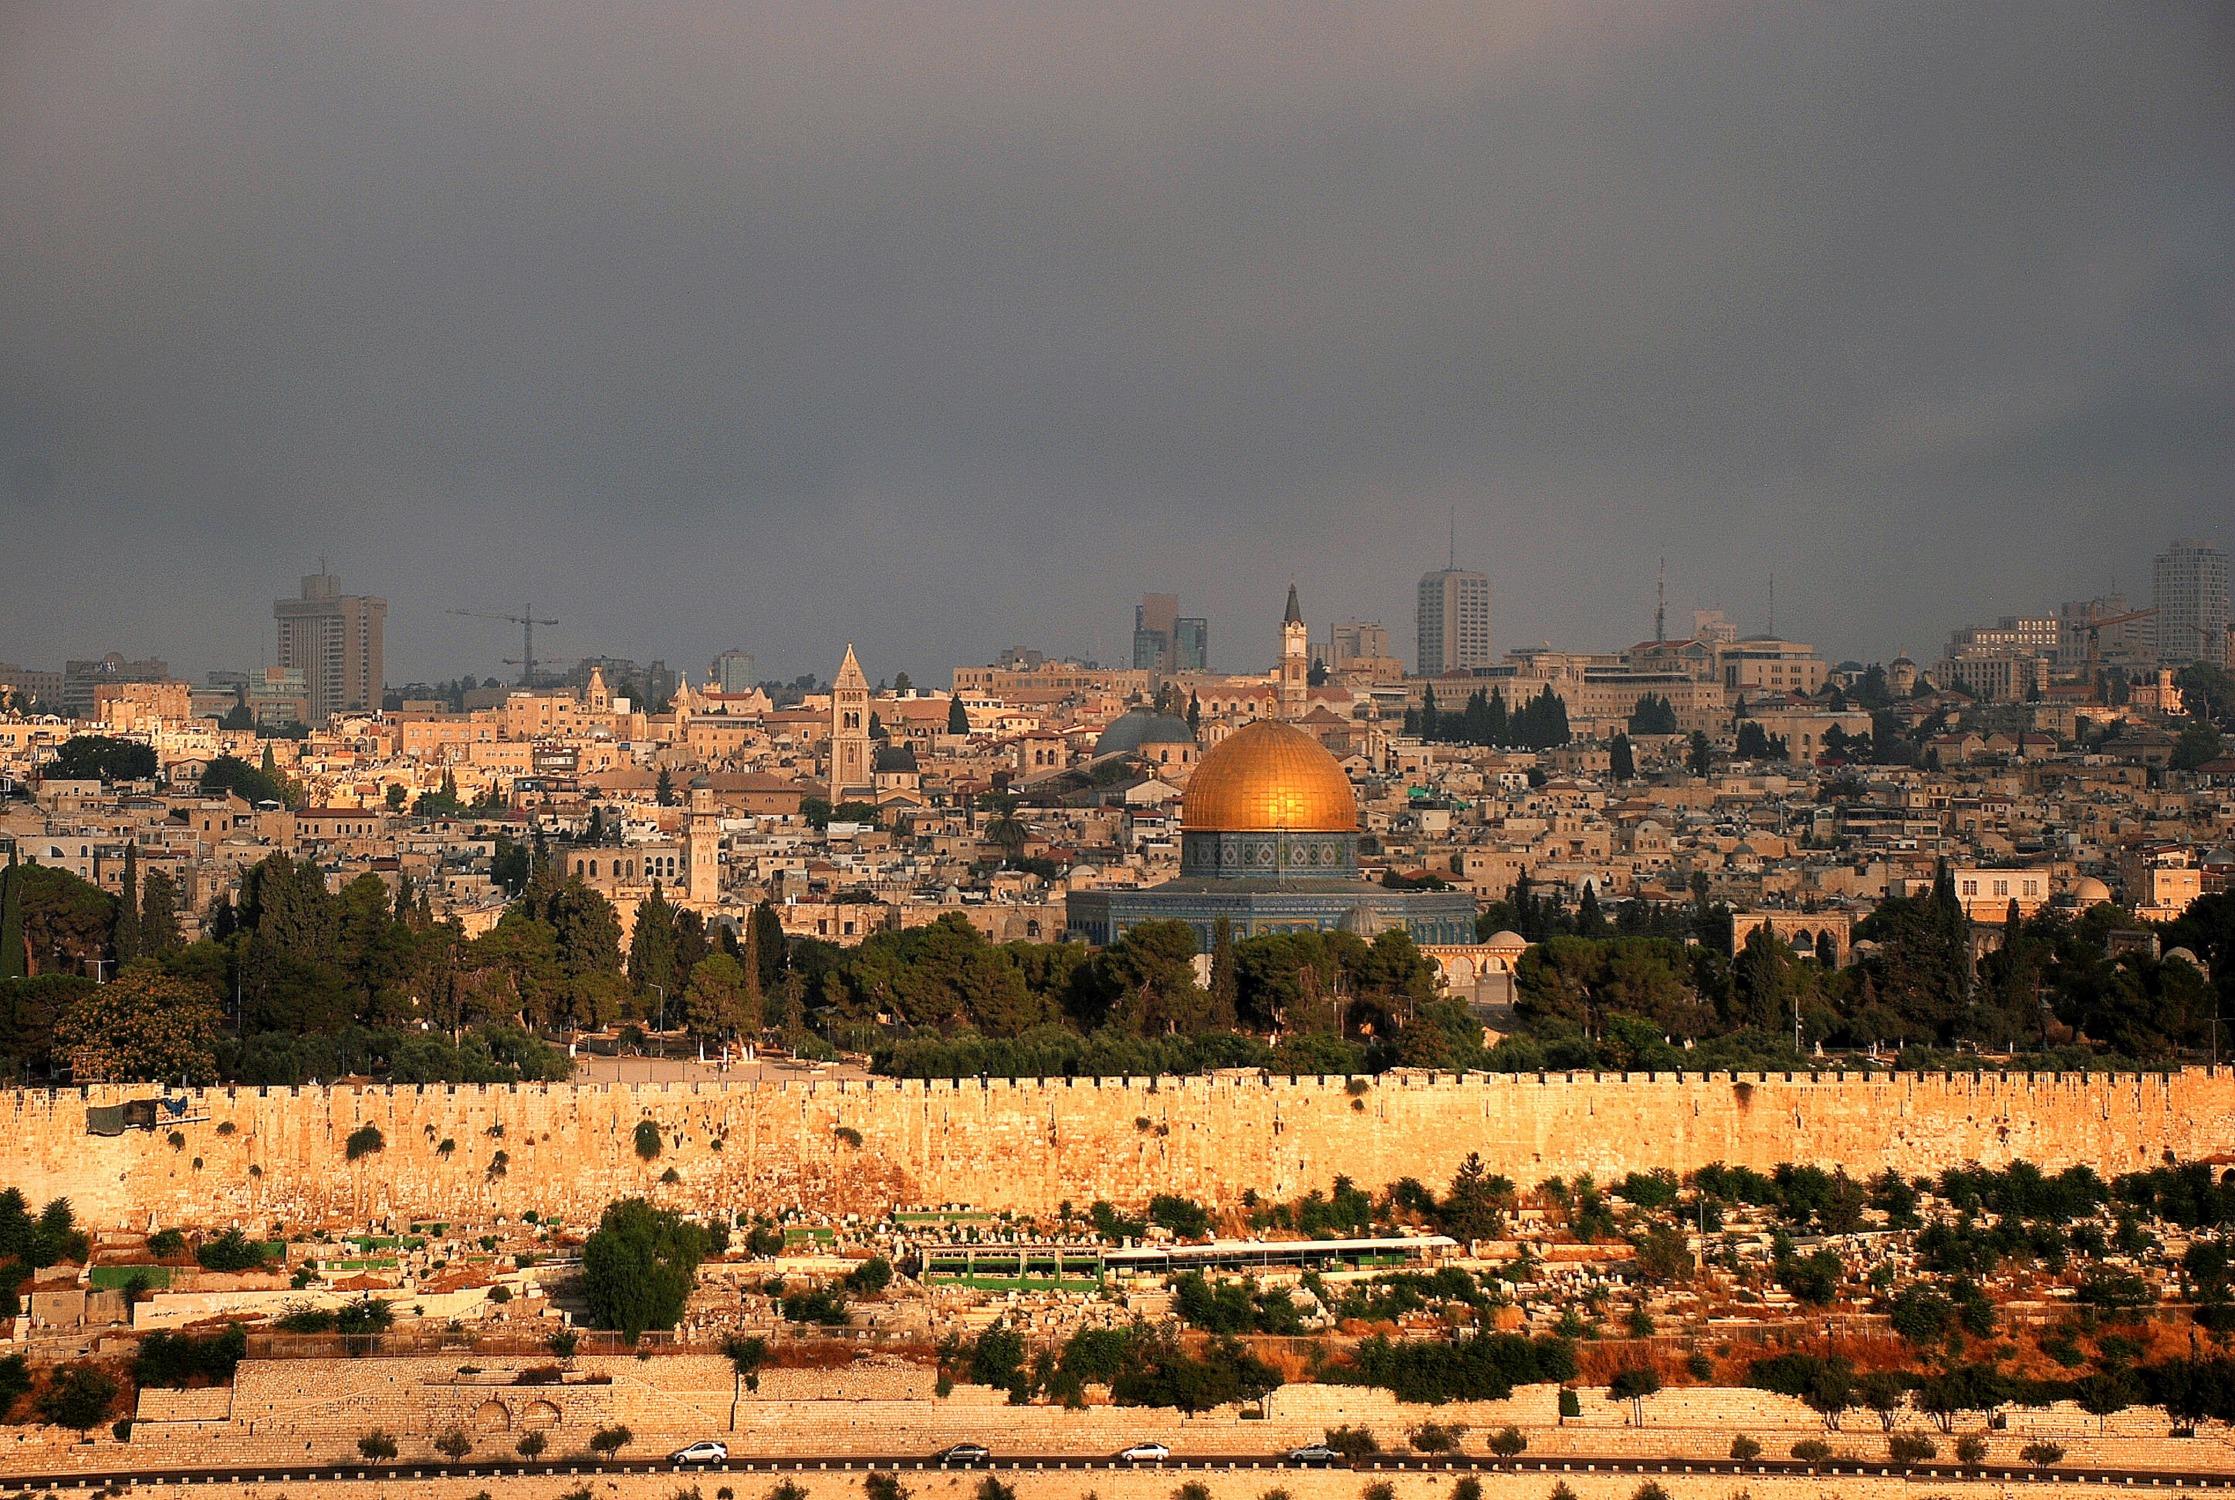 Monte do Templo em Jerusalém, Israel (Yang Jing / Unsplash)